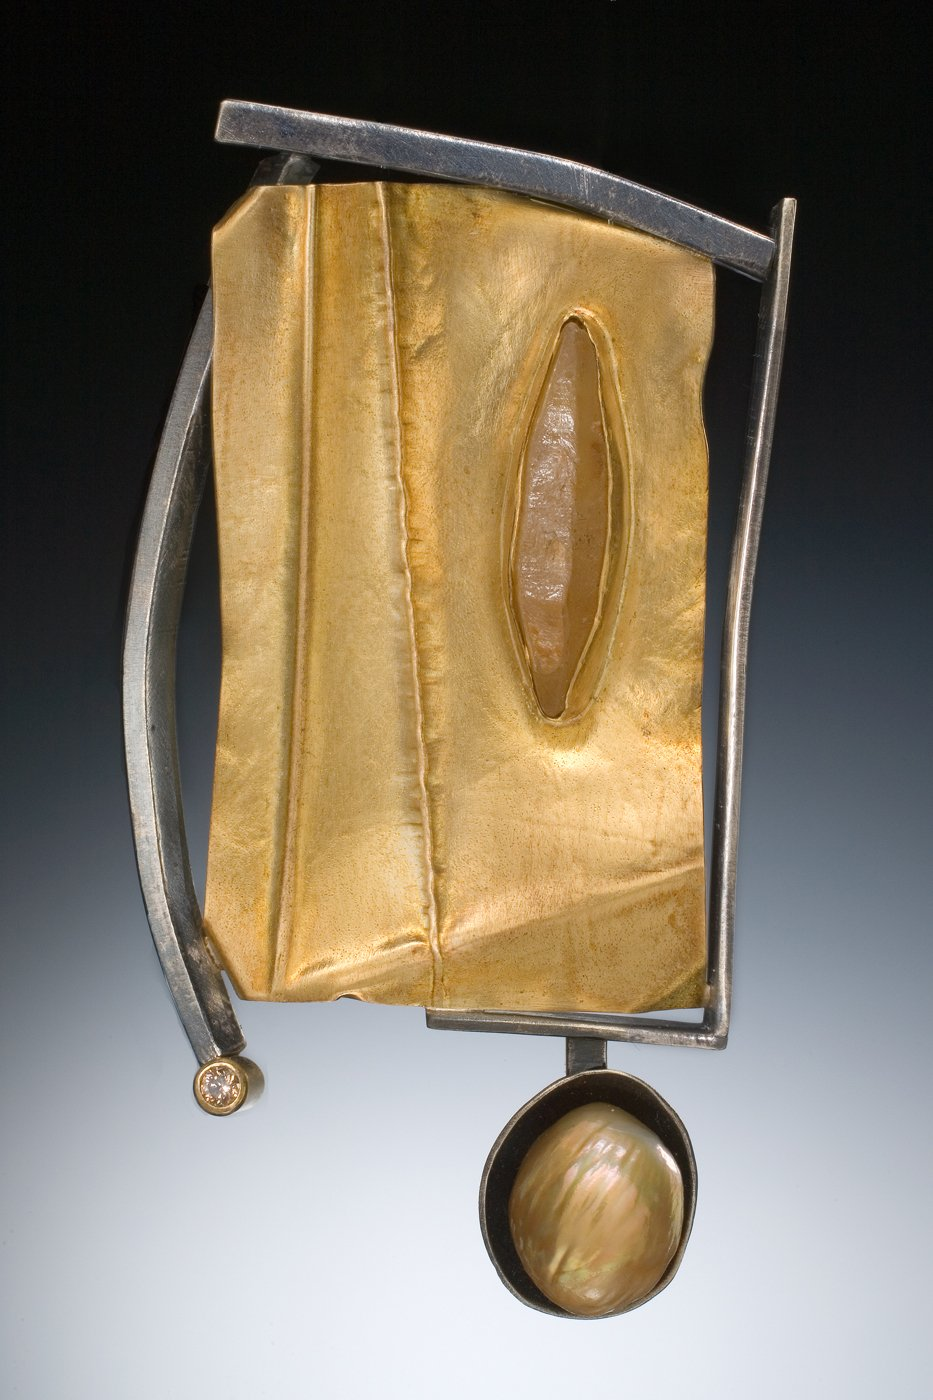 Folded Gold Brooch By Deborrah Daher Gold Silver